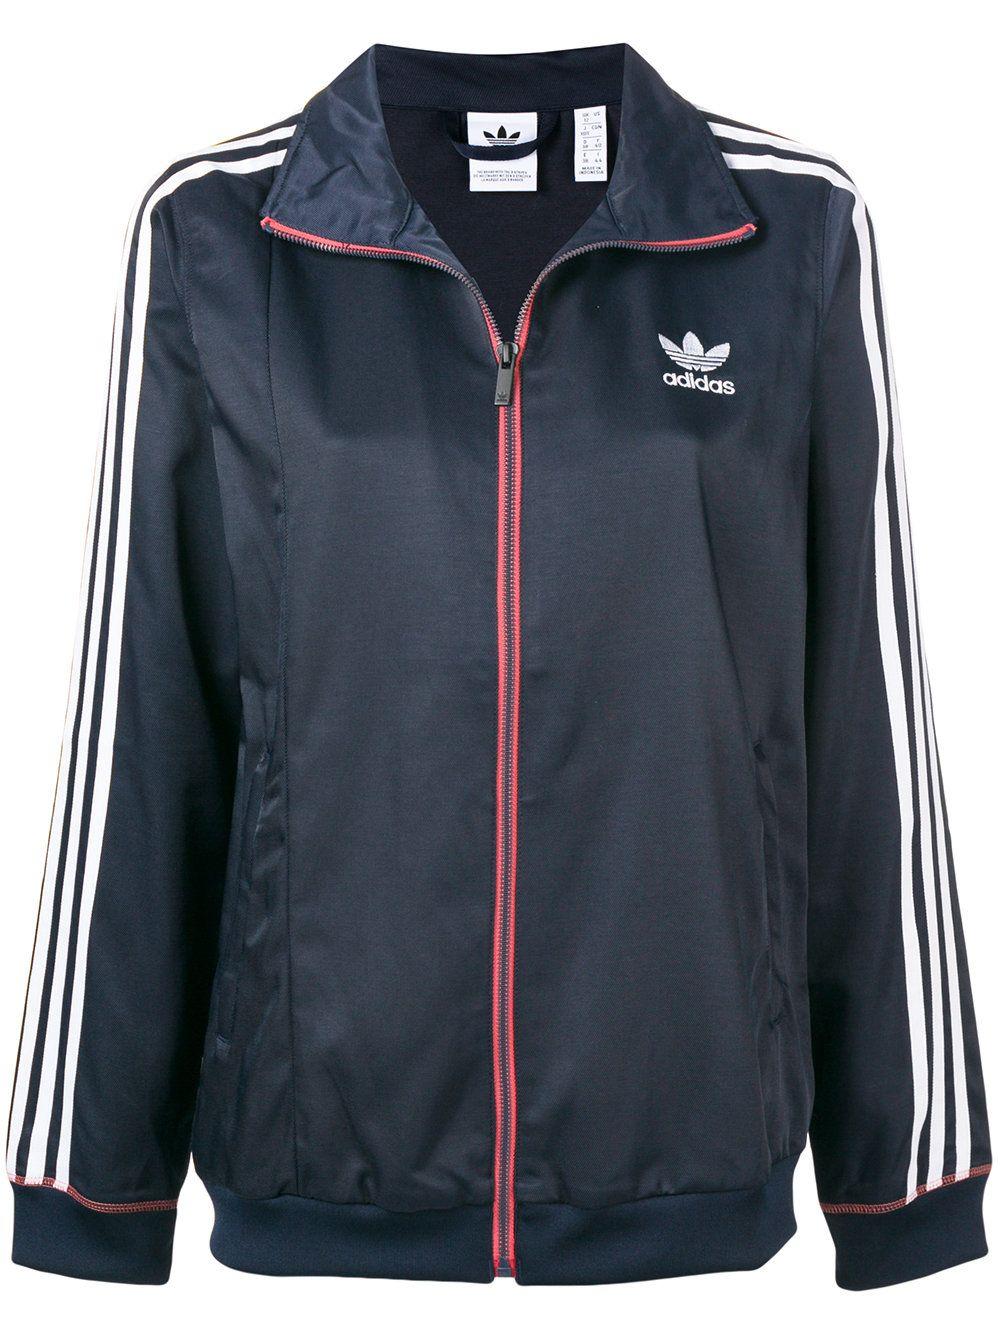 #PopbelaOOTD: Jaket Olahraga Keren